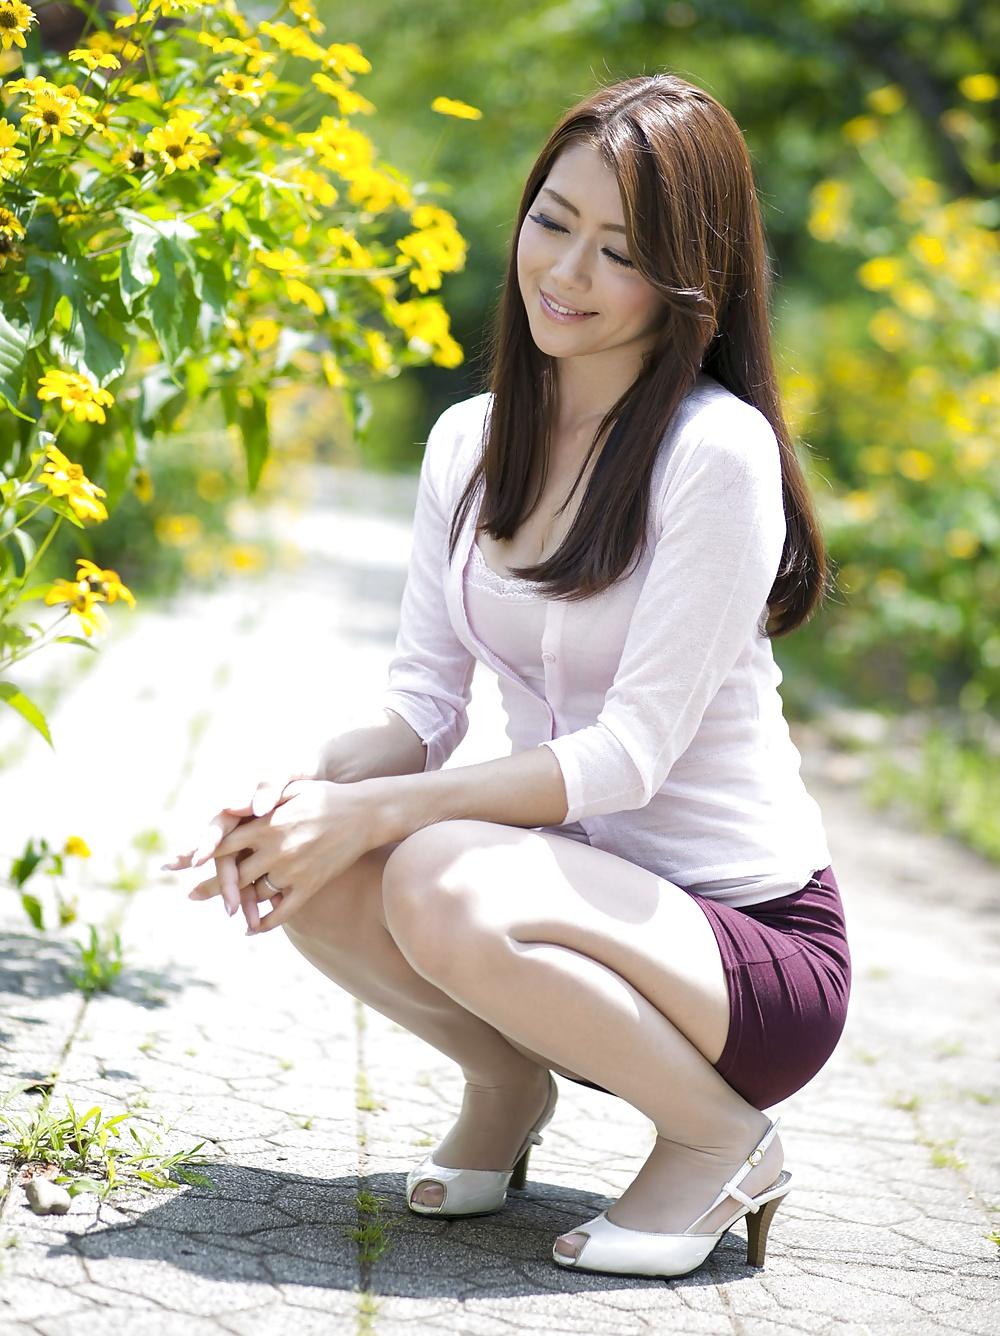 Amateur Asians: Sexy Asian Milf 1